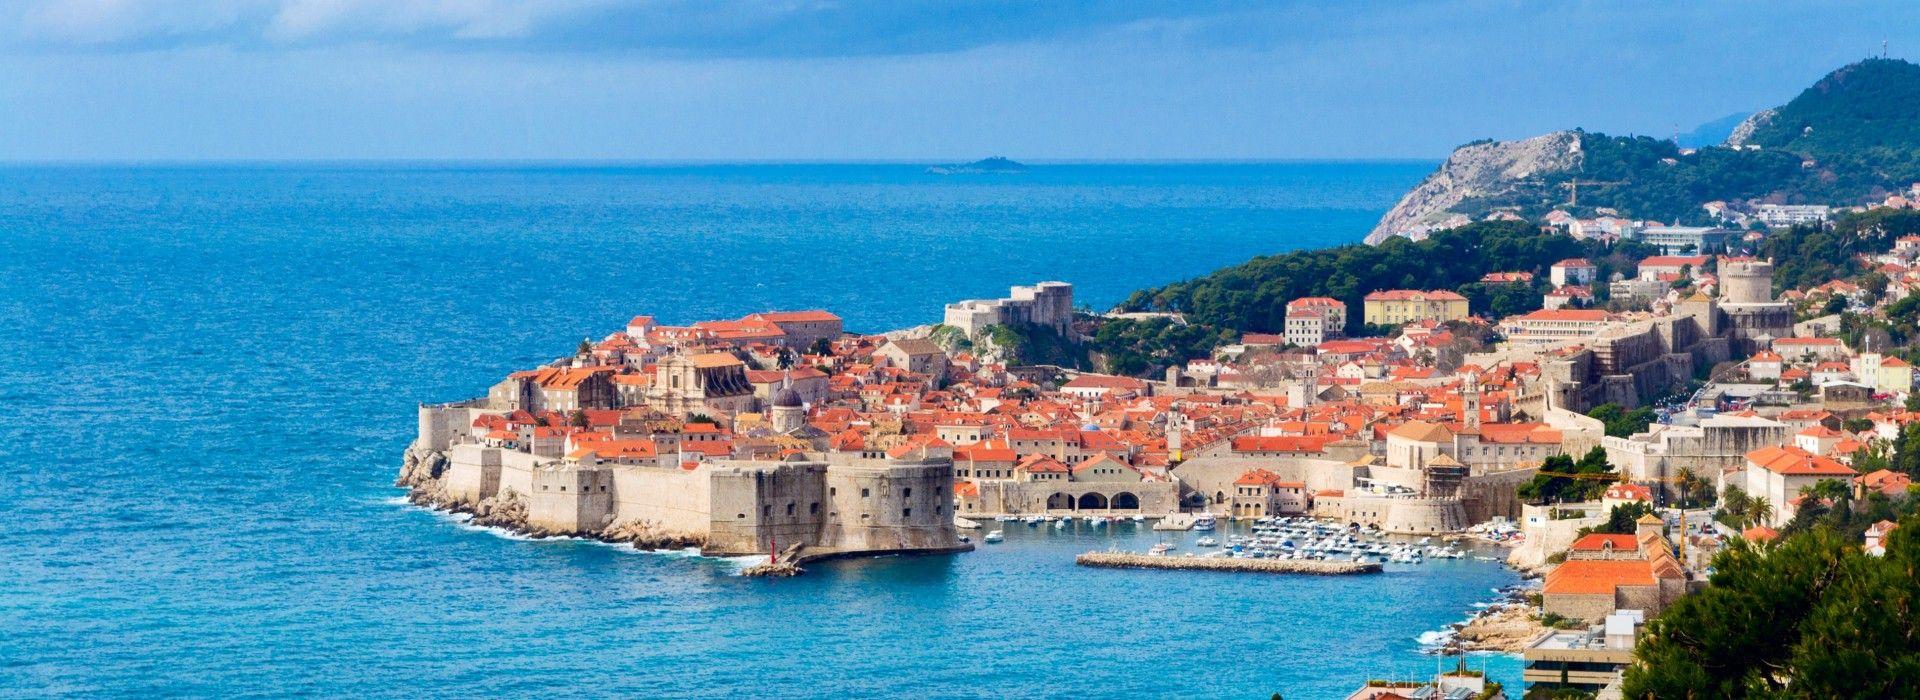 Wine tasting tours in Croatia